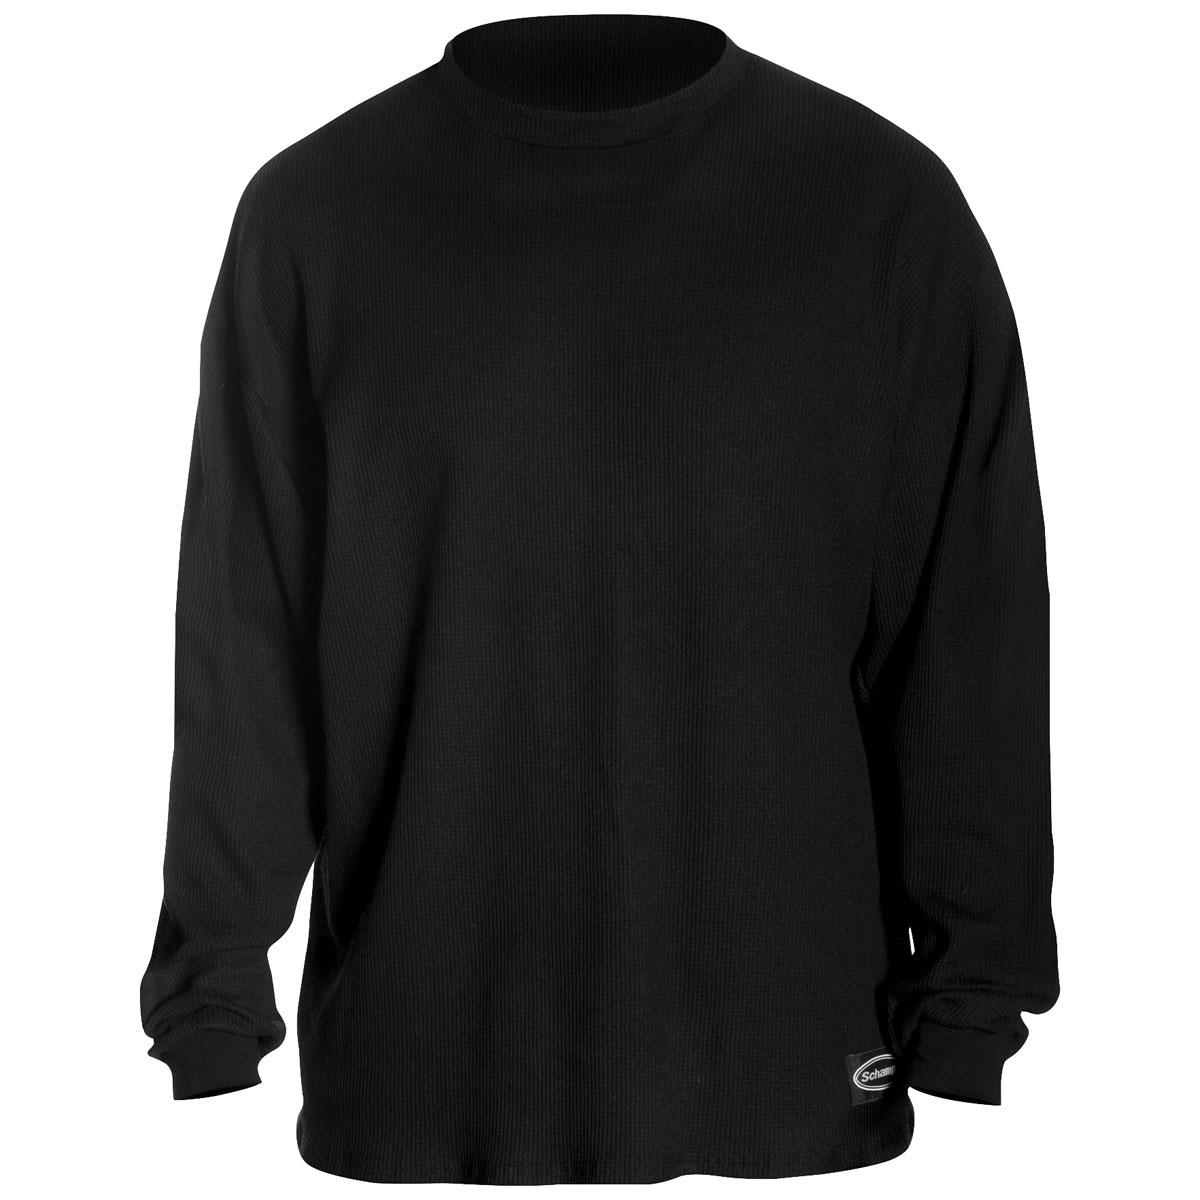 Schampa Men's Old School Fleece Lined Black Thermal Long Sleeve Shirt